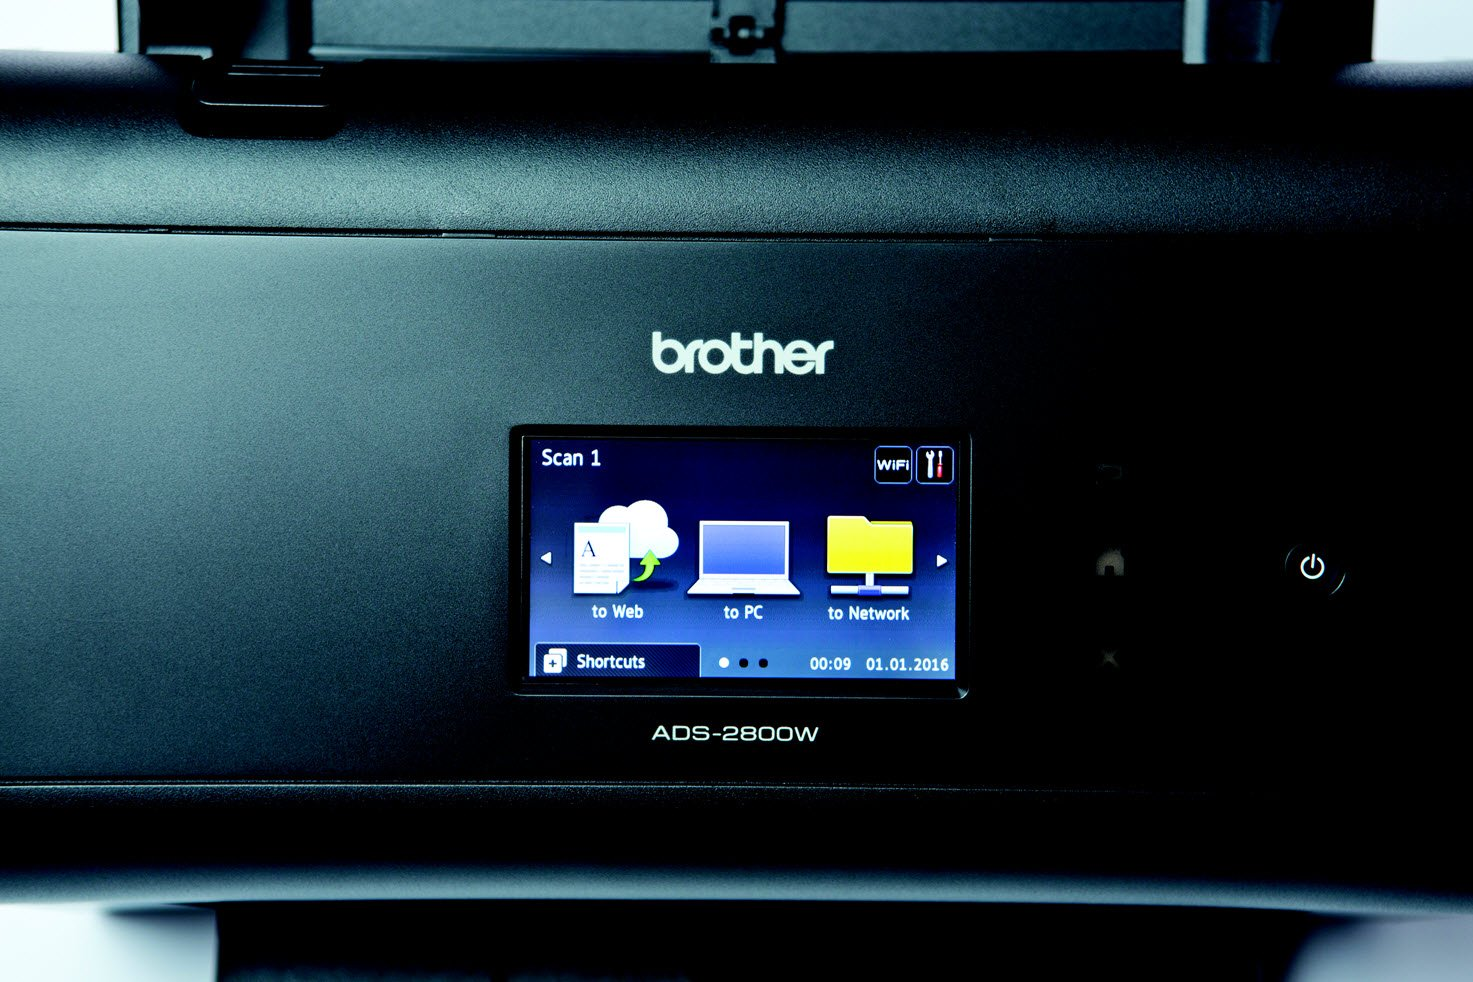 Brother scanner